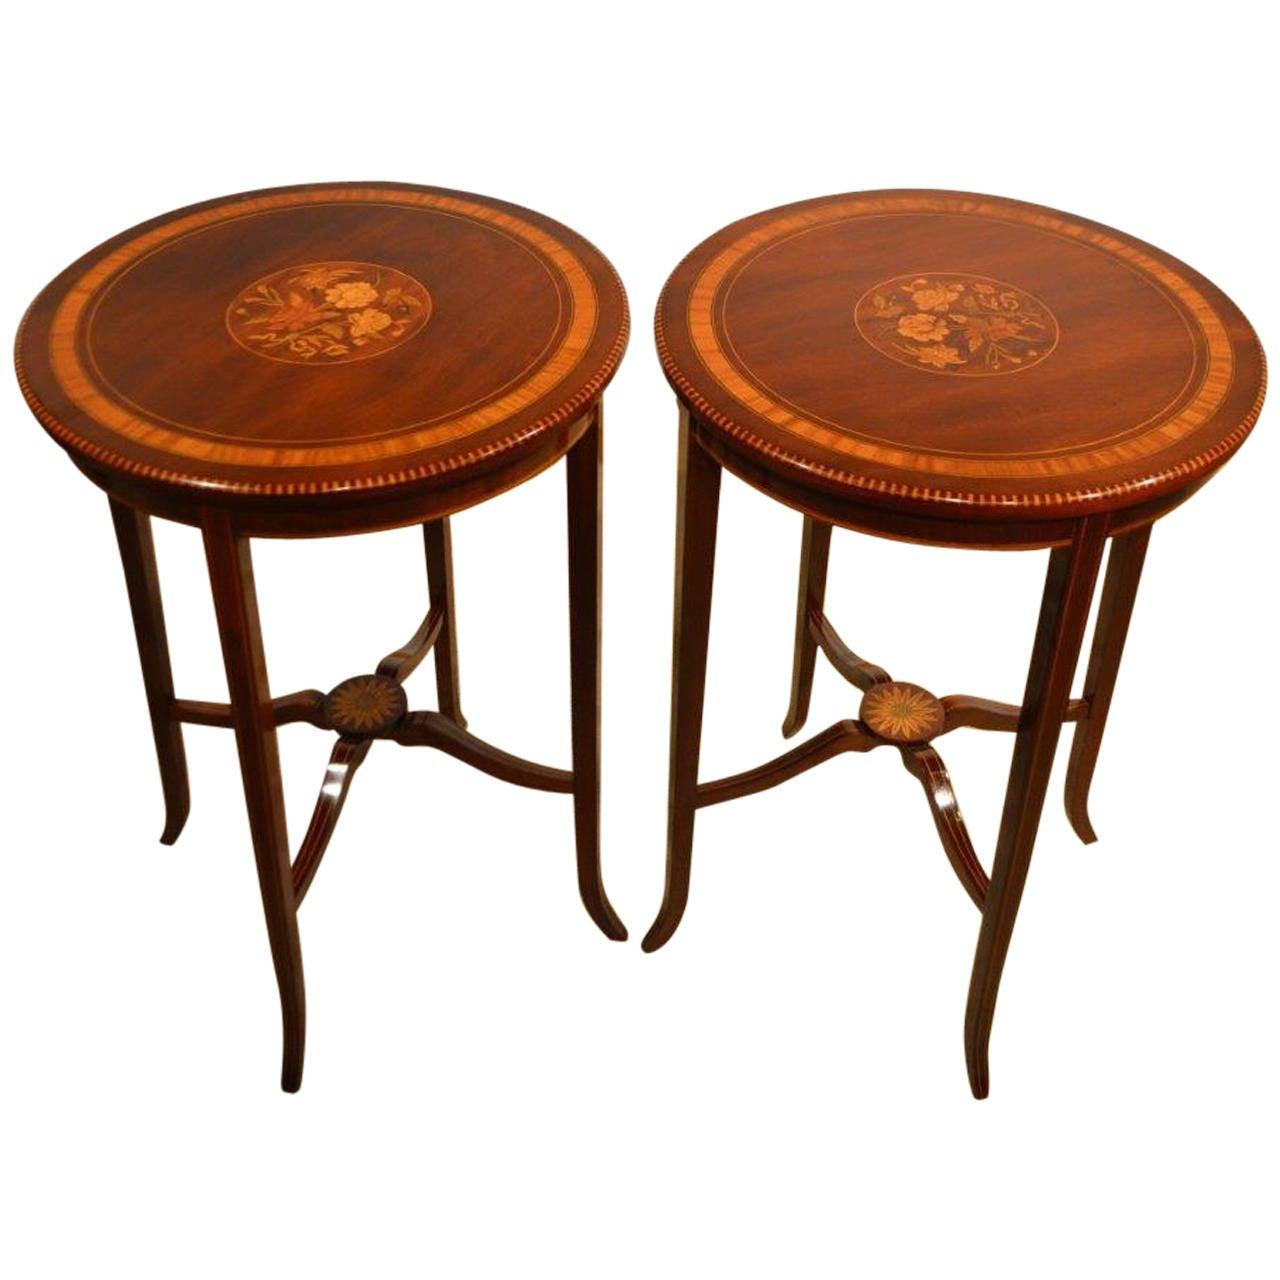 Pair of mahogany inlaid edwardian period occasional or lamp tables pair of mahogany inlaid edwardian period occasional or lamp tables 1 geotapseo Gallery